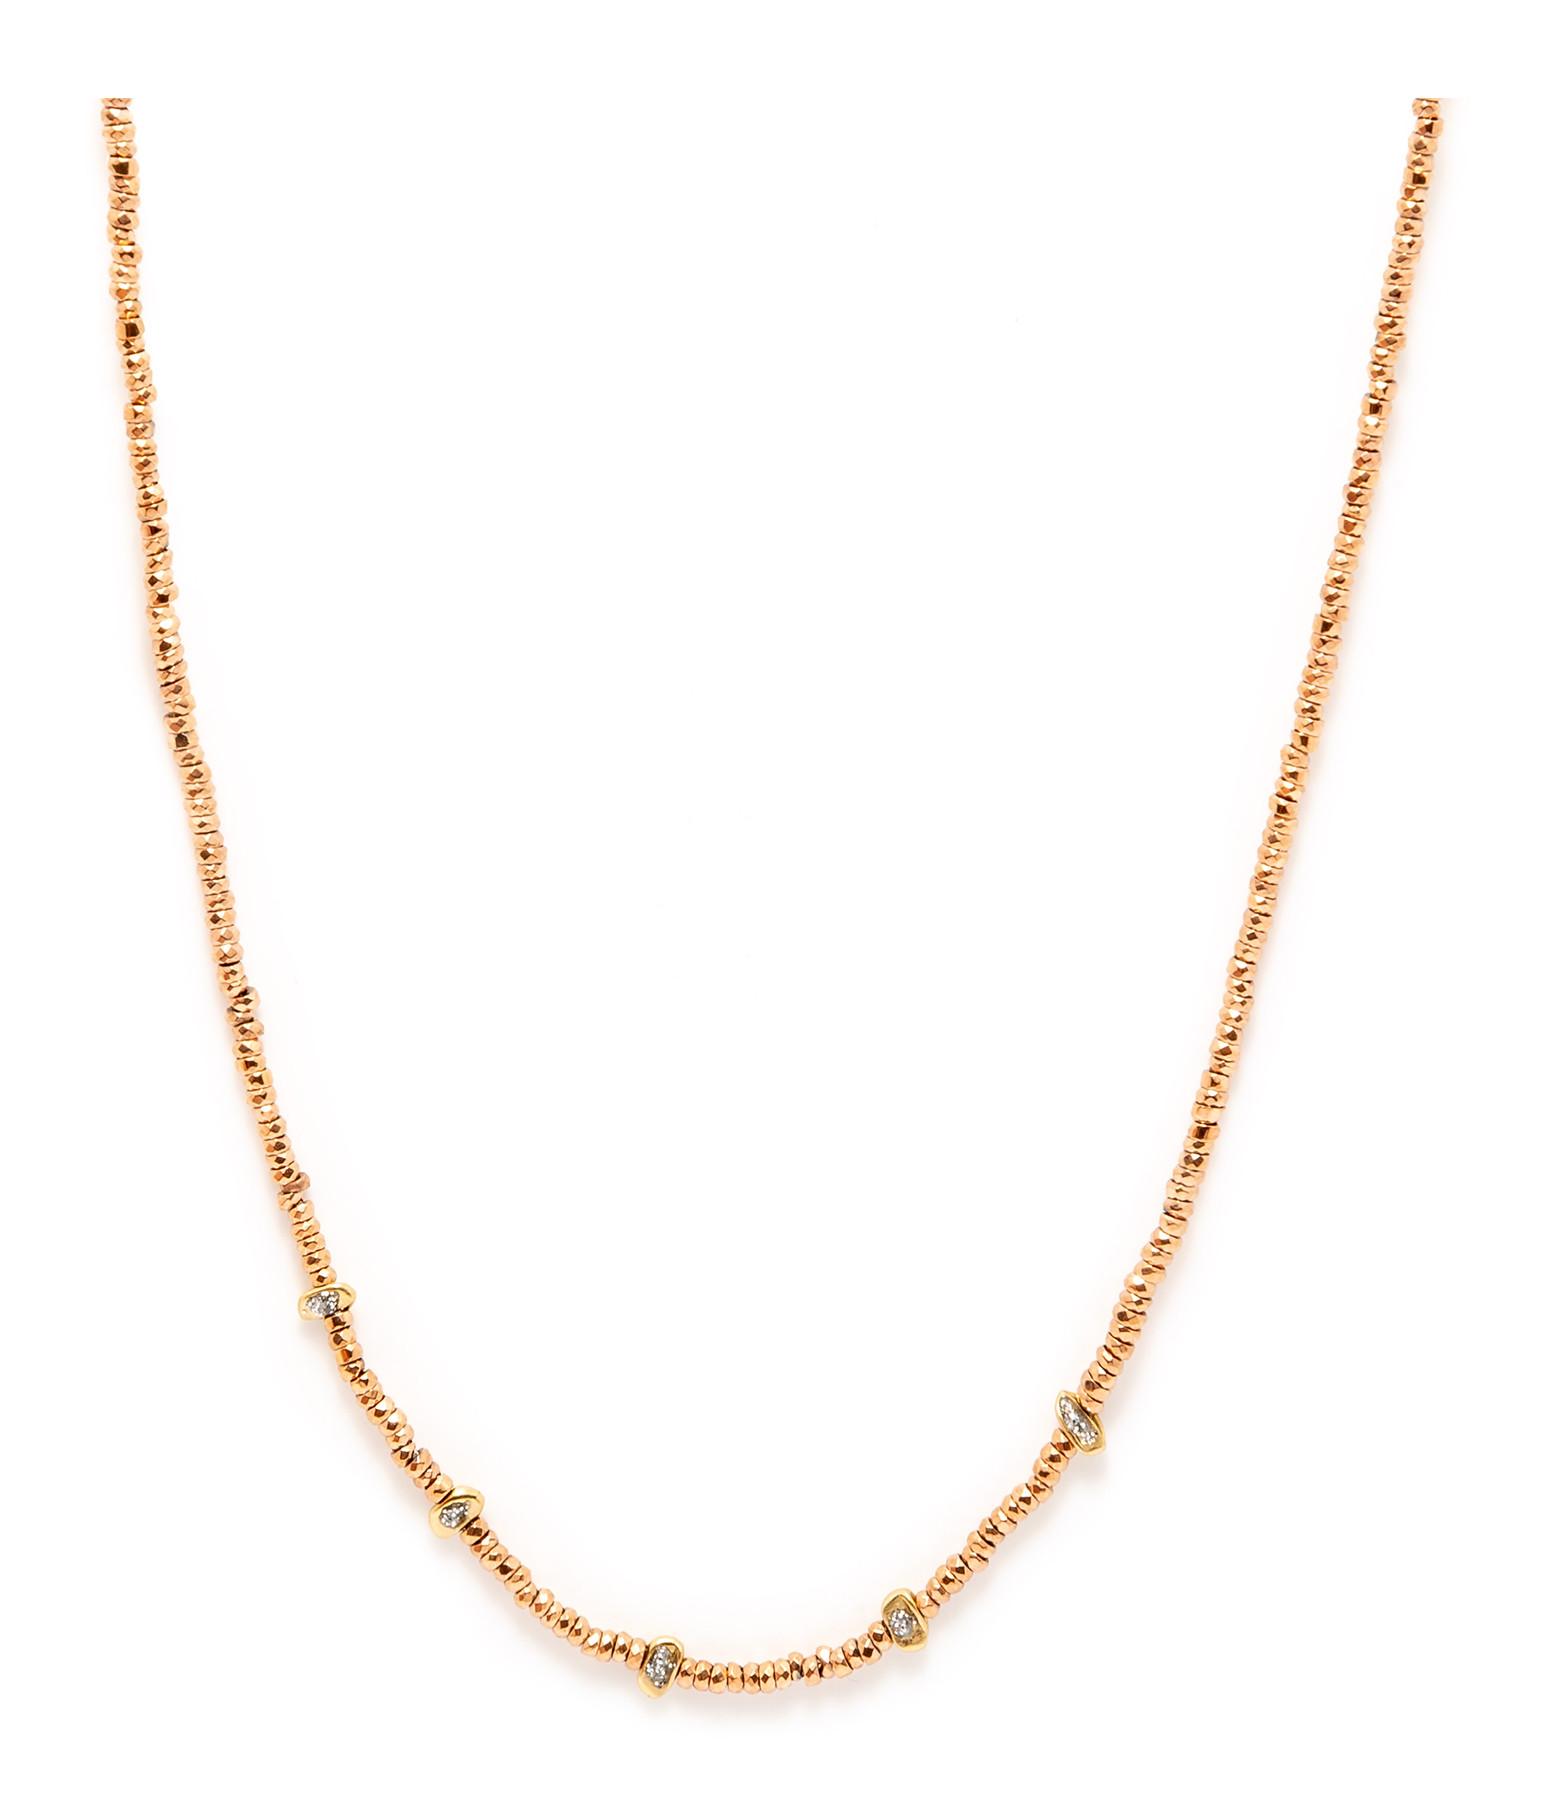 LSONGE - Collier Sublime 5 Perles Or Hématite Rose